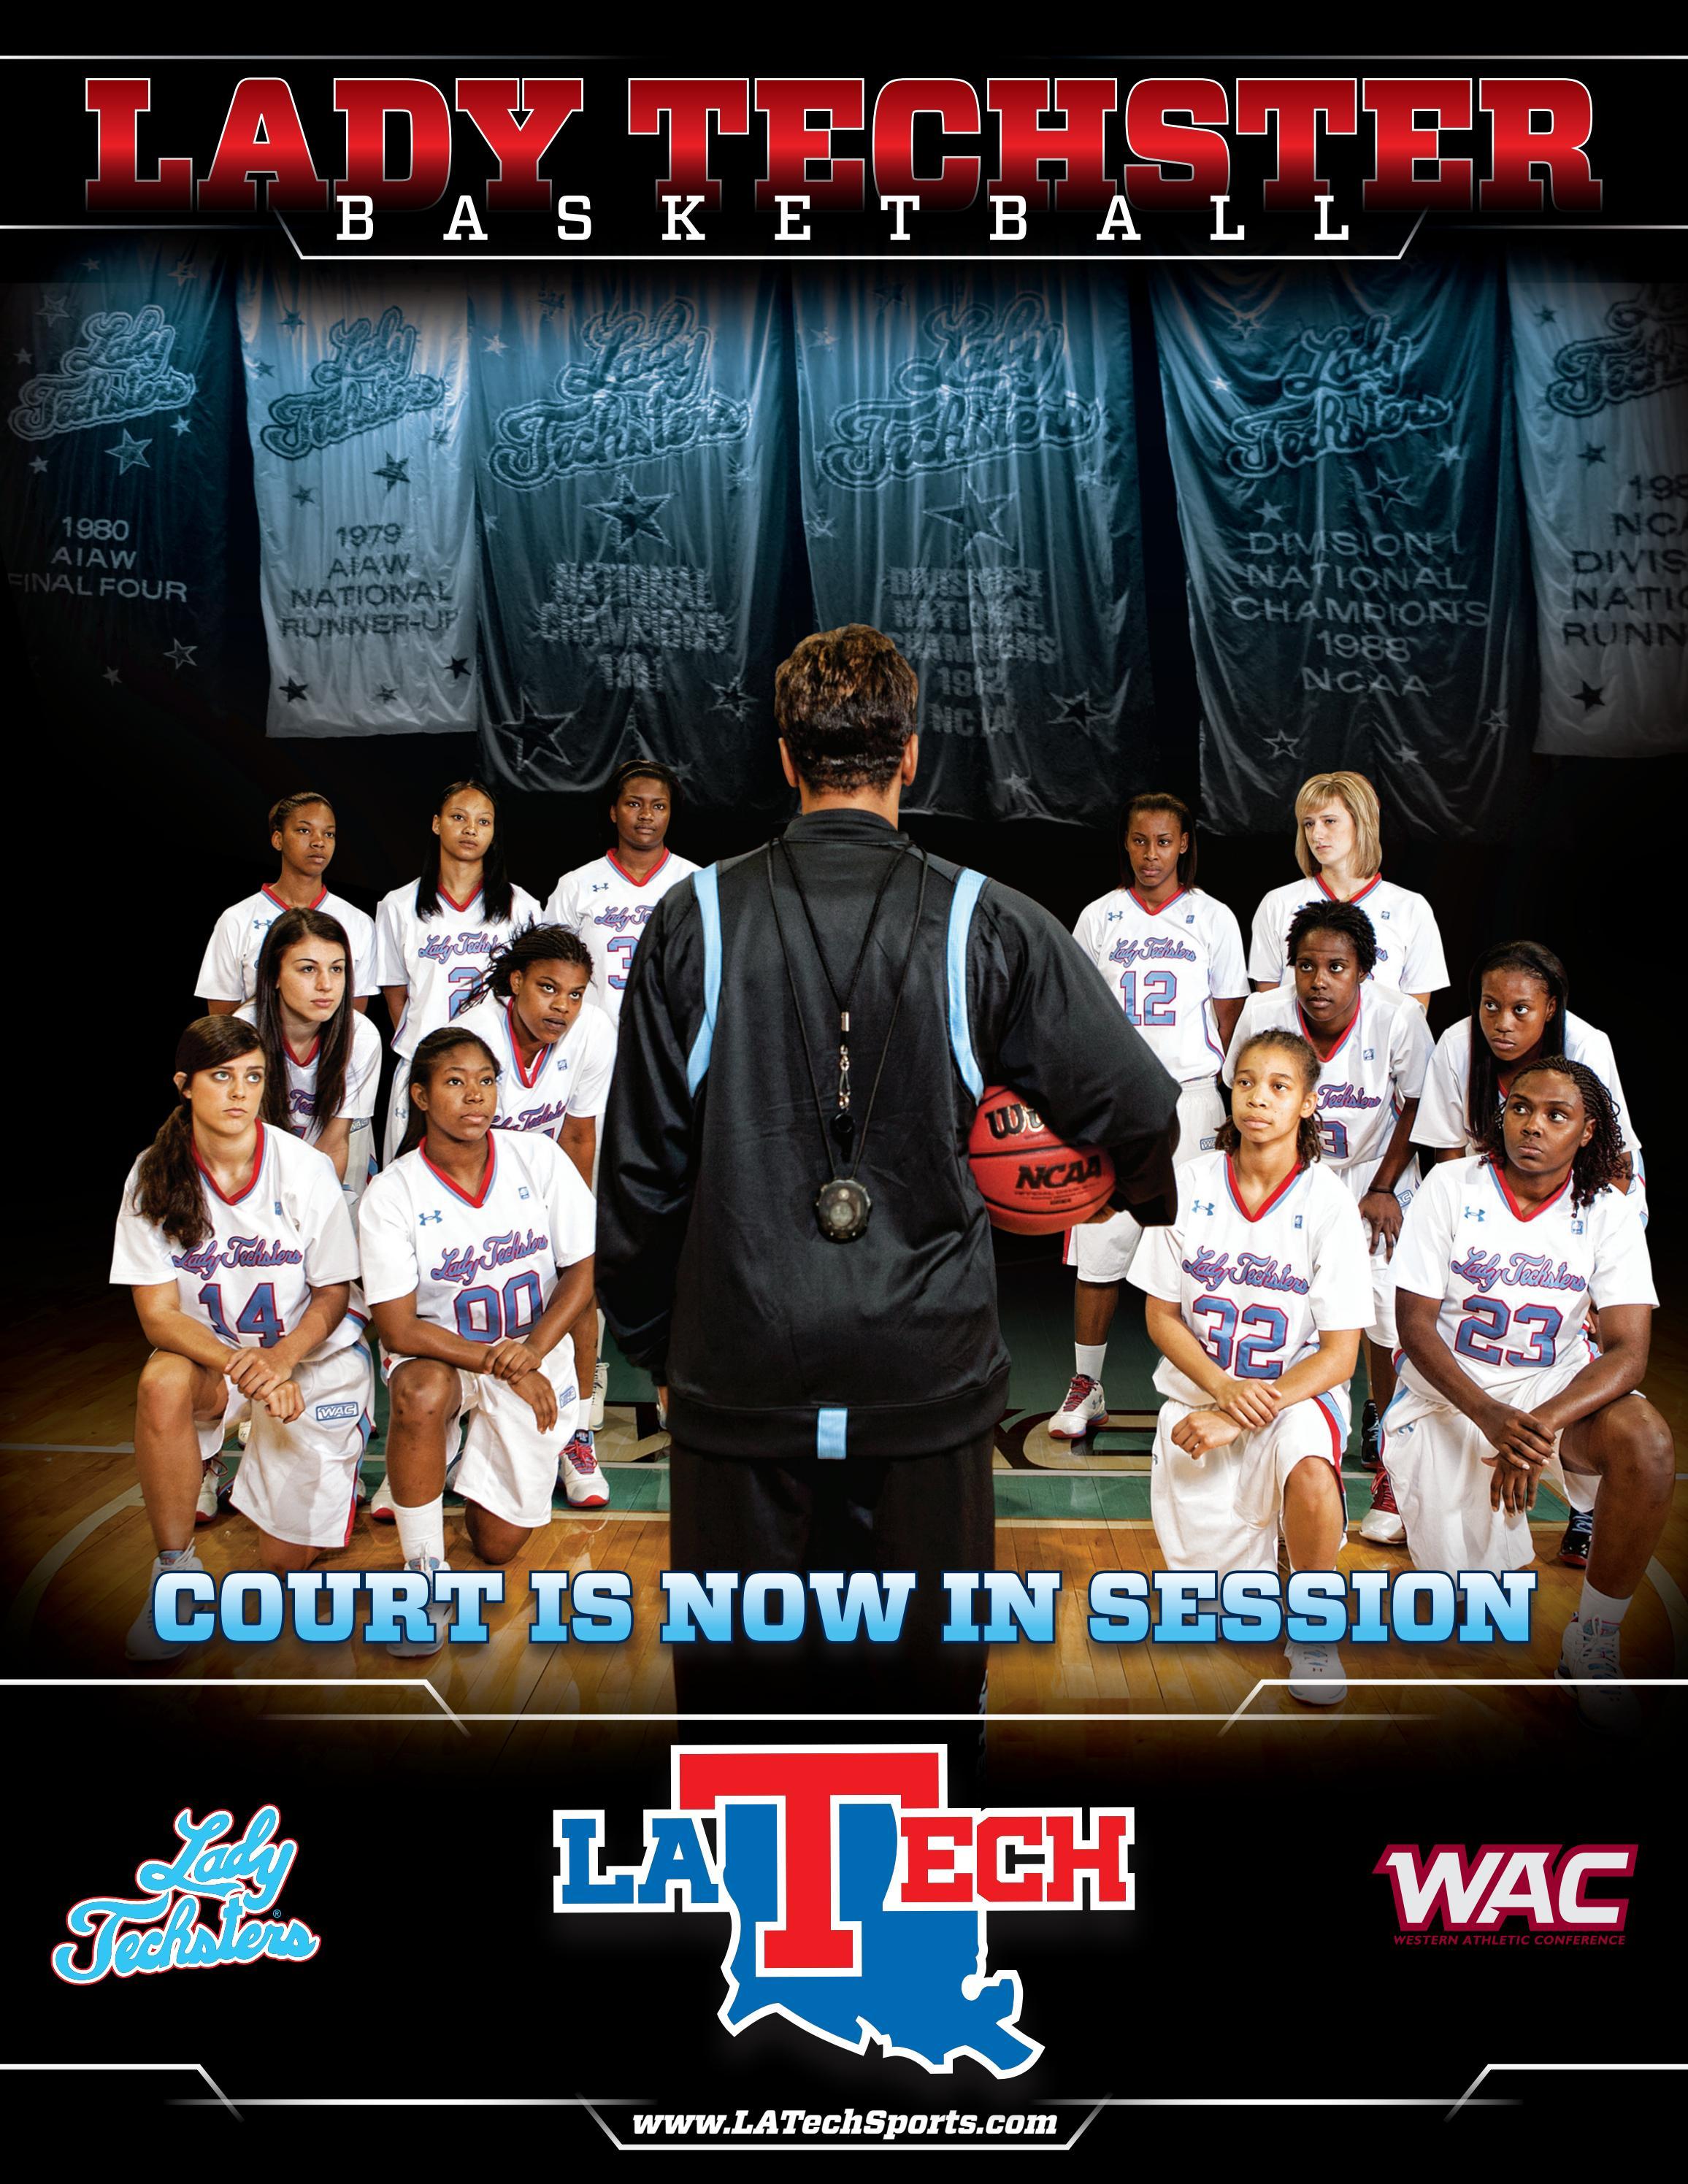 2011-12 Louisiana Tech Women s Basketball Media Guide by Louisiana Tech  Athletics - issuu 563ecc340